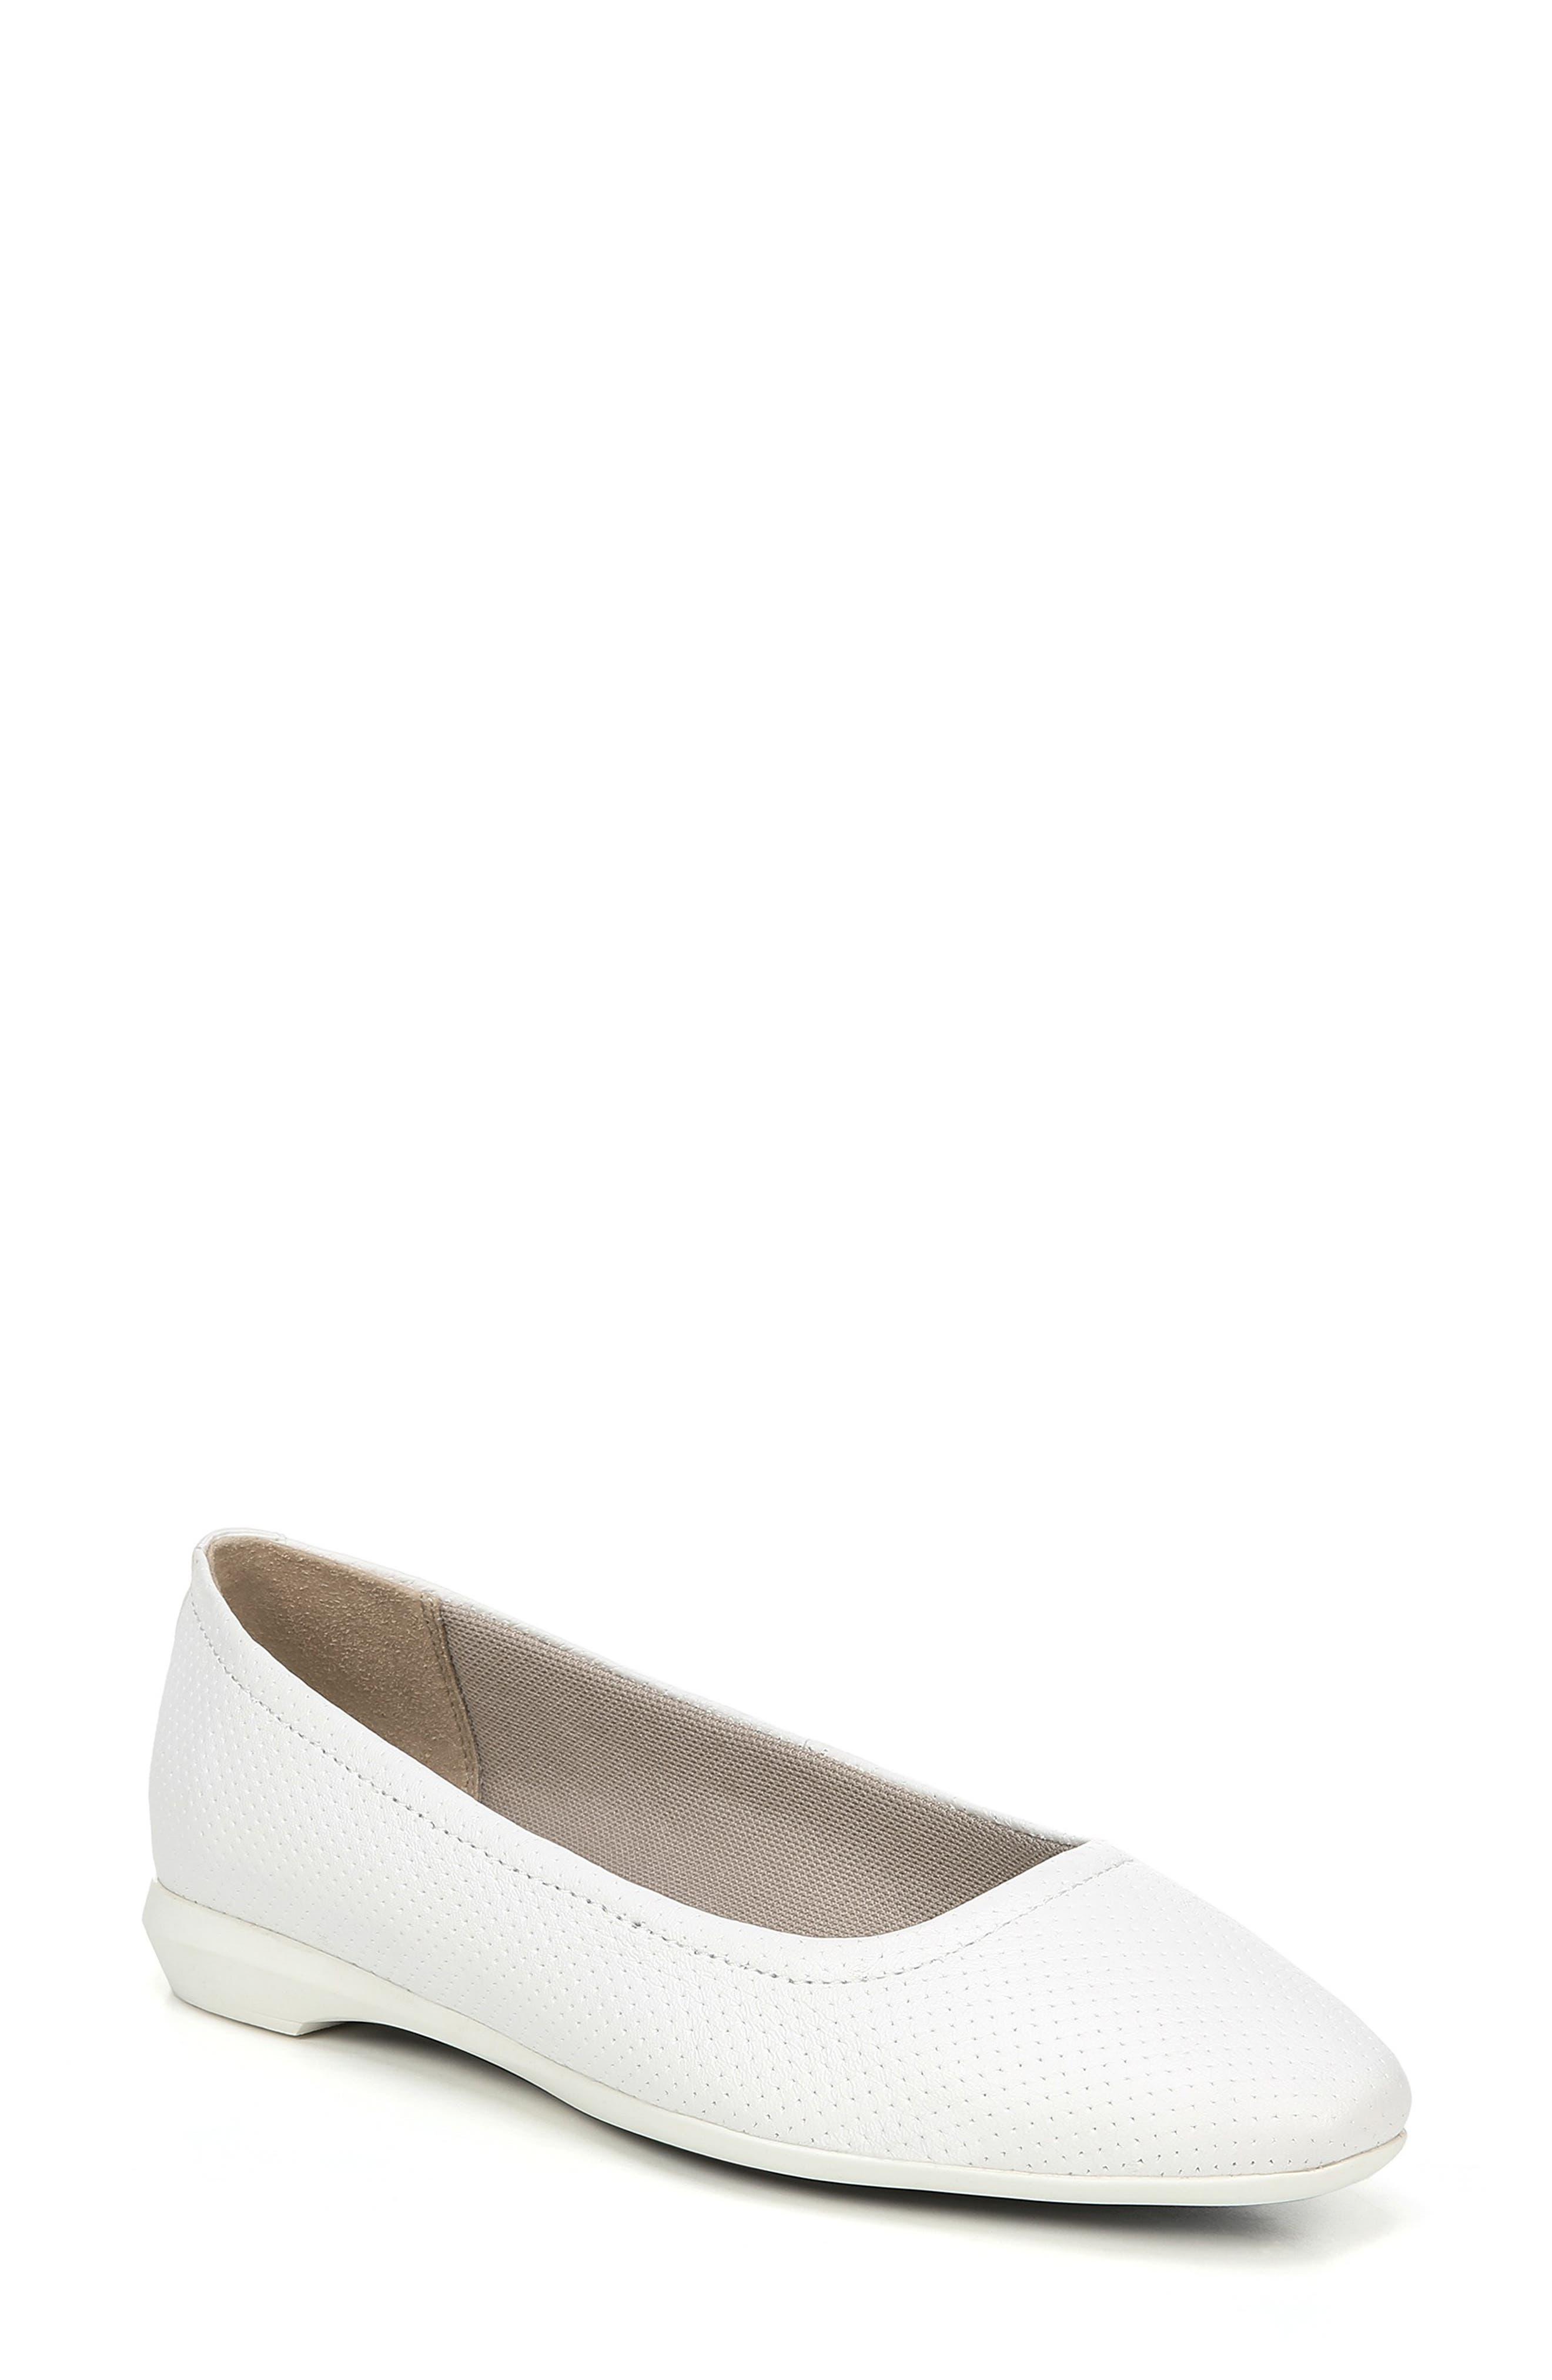 Naturalizer Alya Flat- White